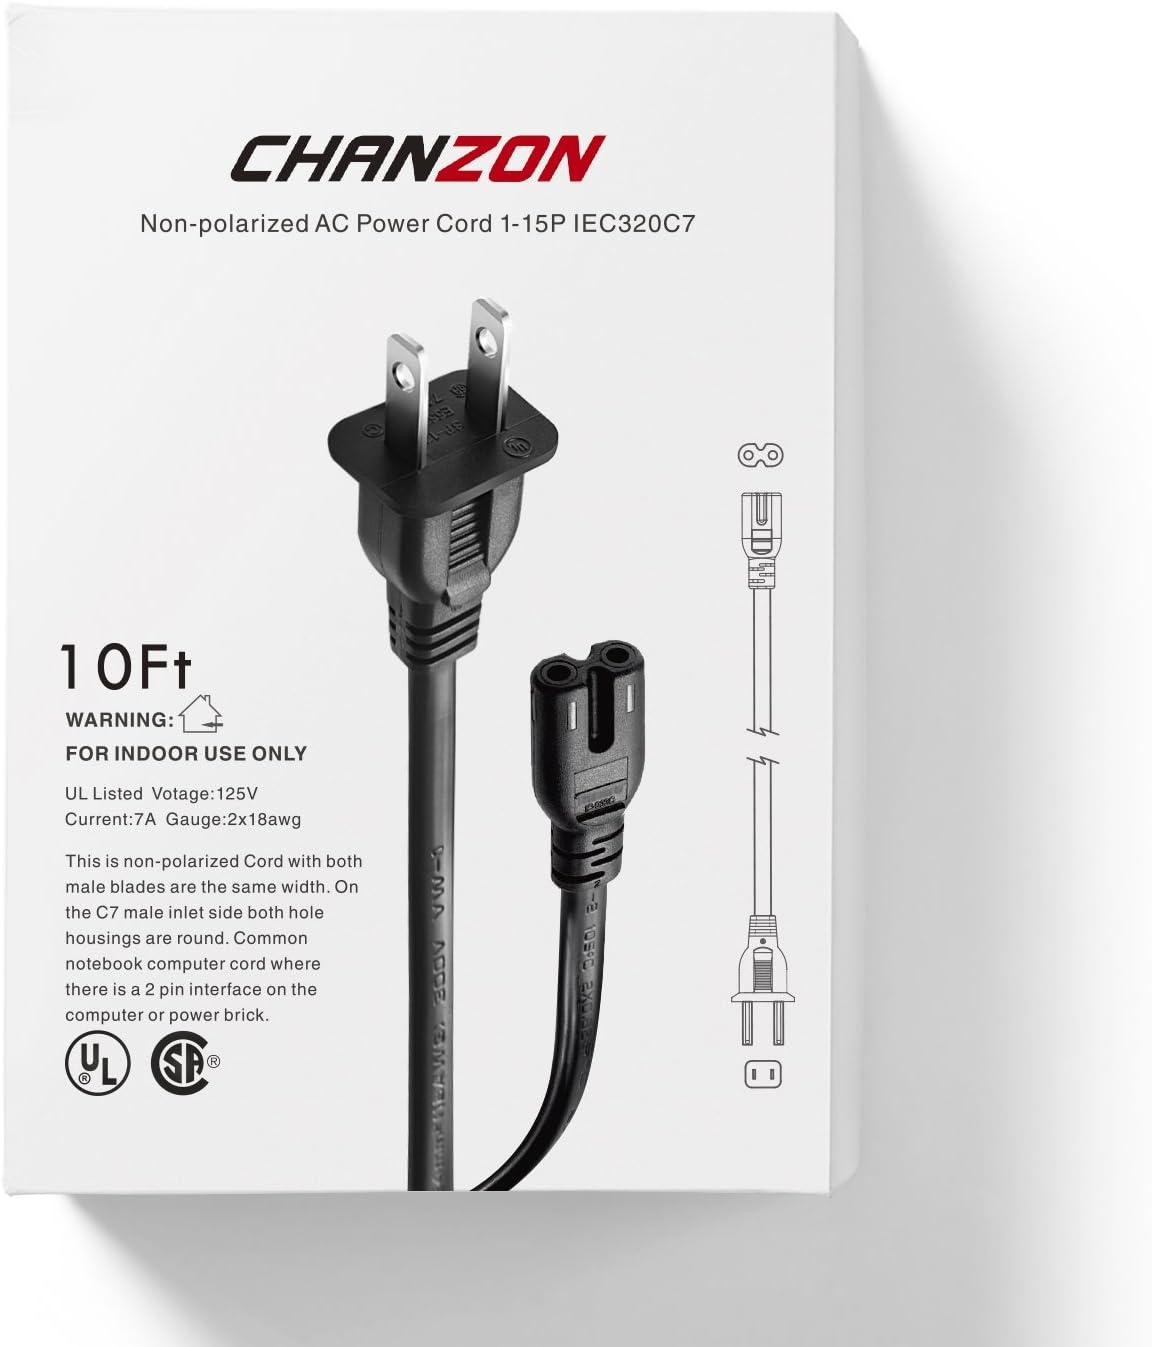 Epson Expression Home XP330 XP340 XP430 XP424 XP520 Printer AC Power Cable Cord